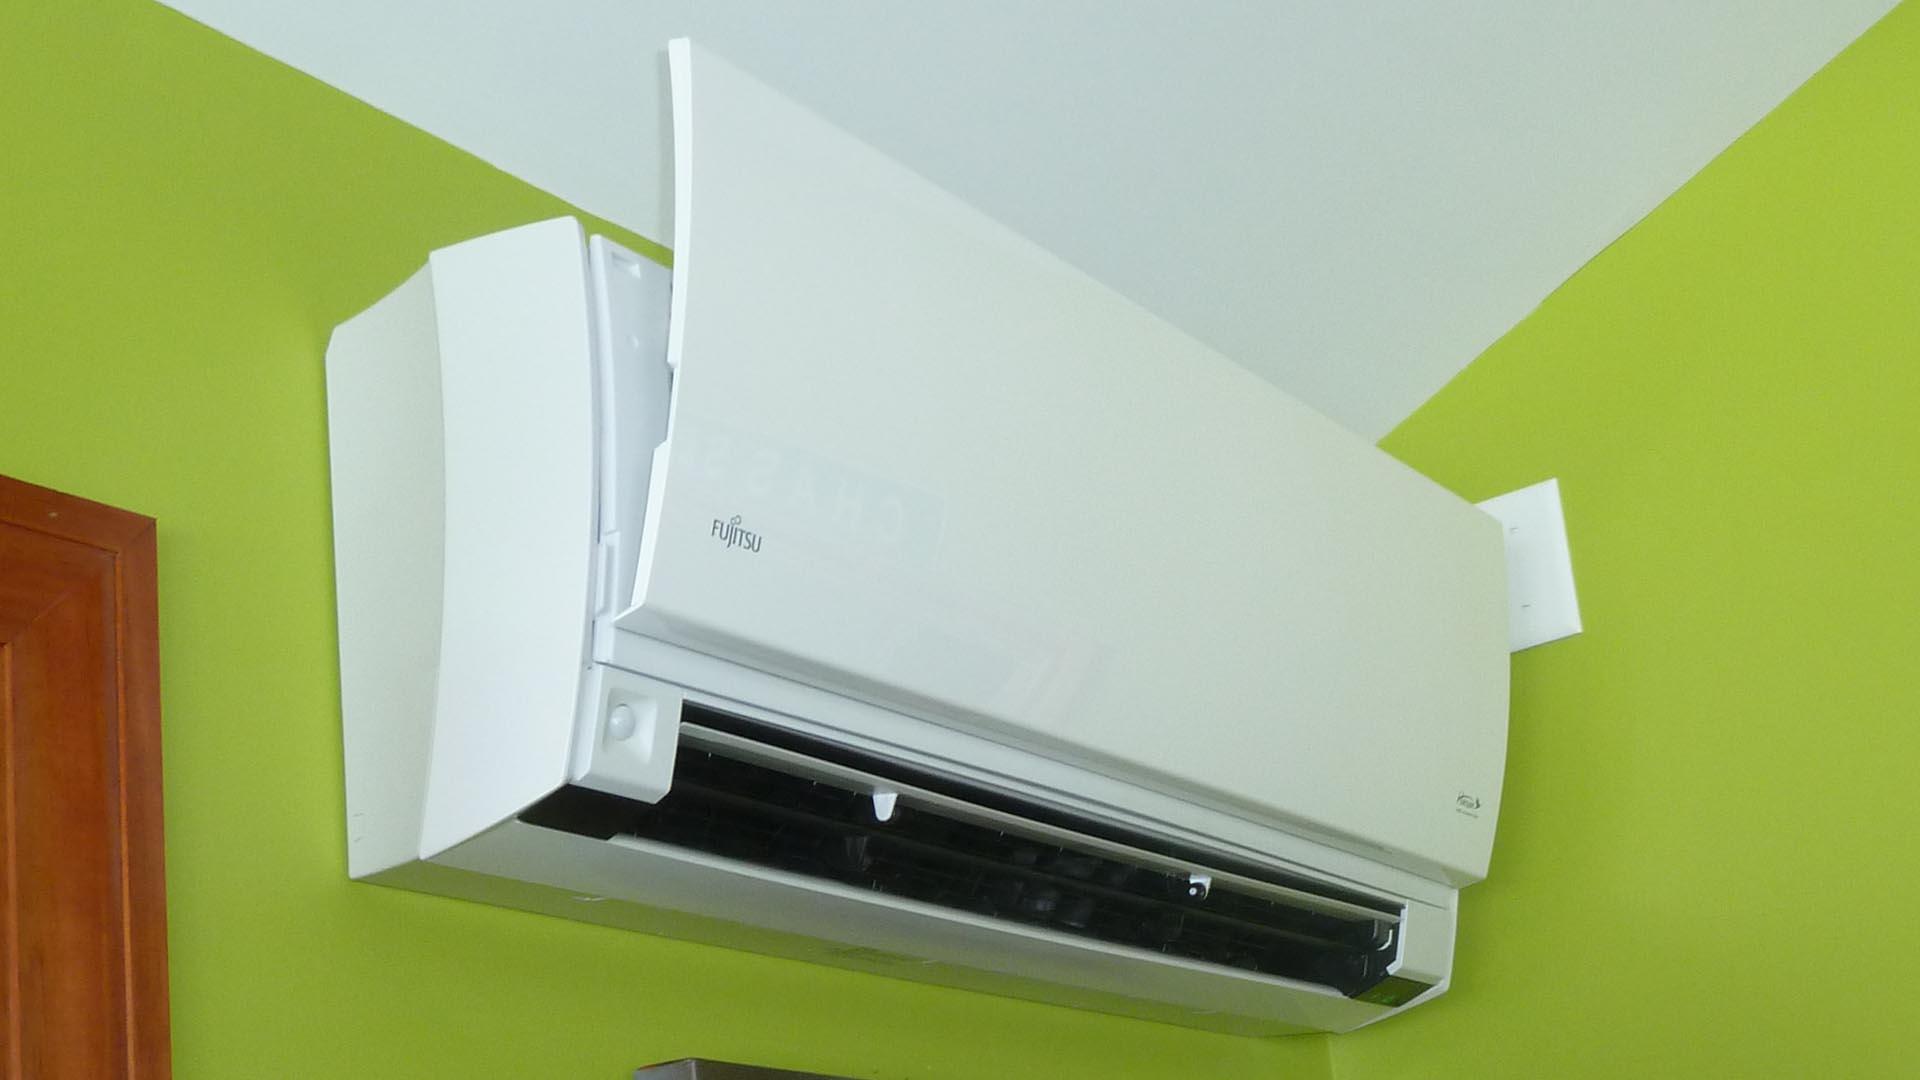 Quadomated  Fujitsu 15RLS2 Heat Pump Installed  My